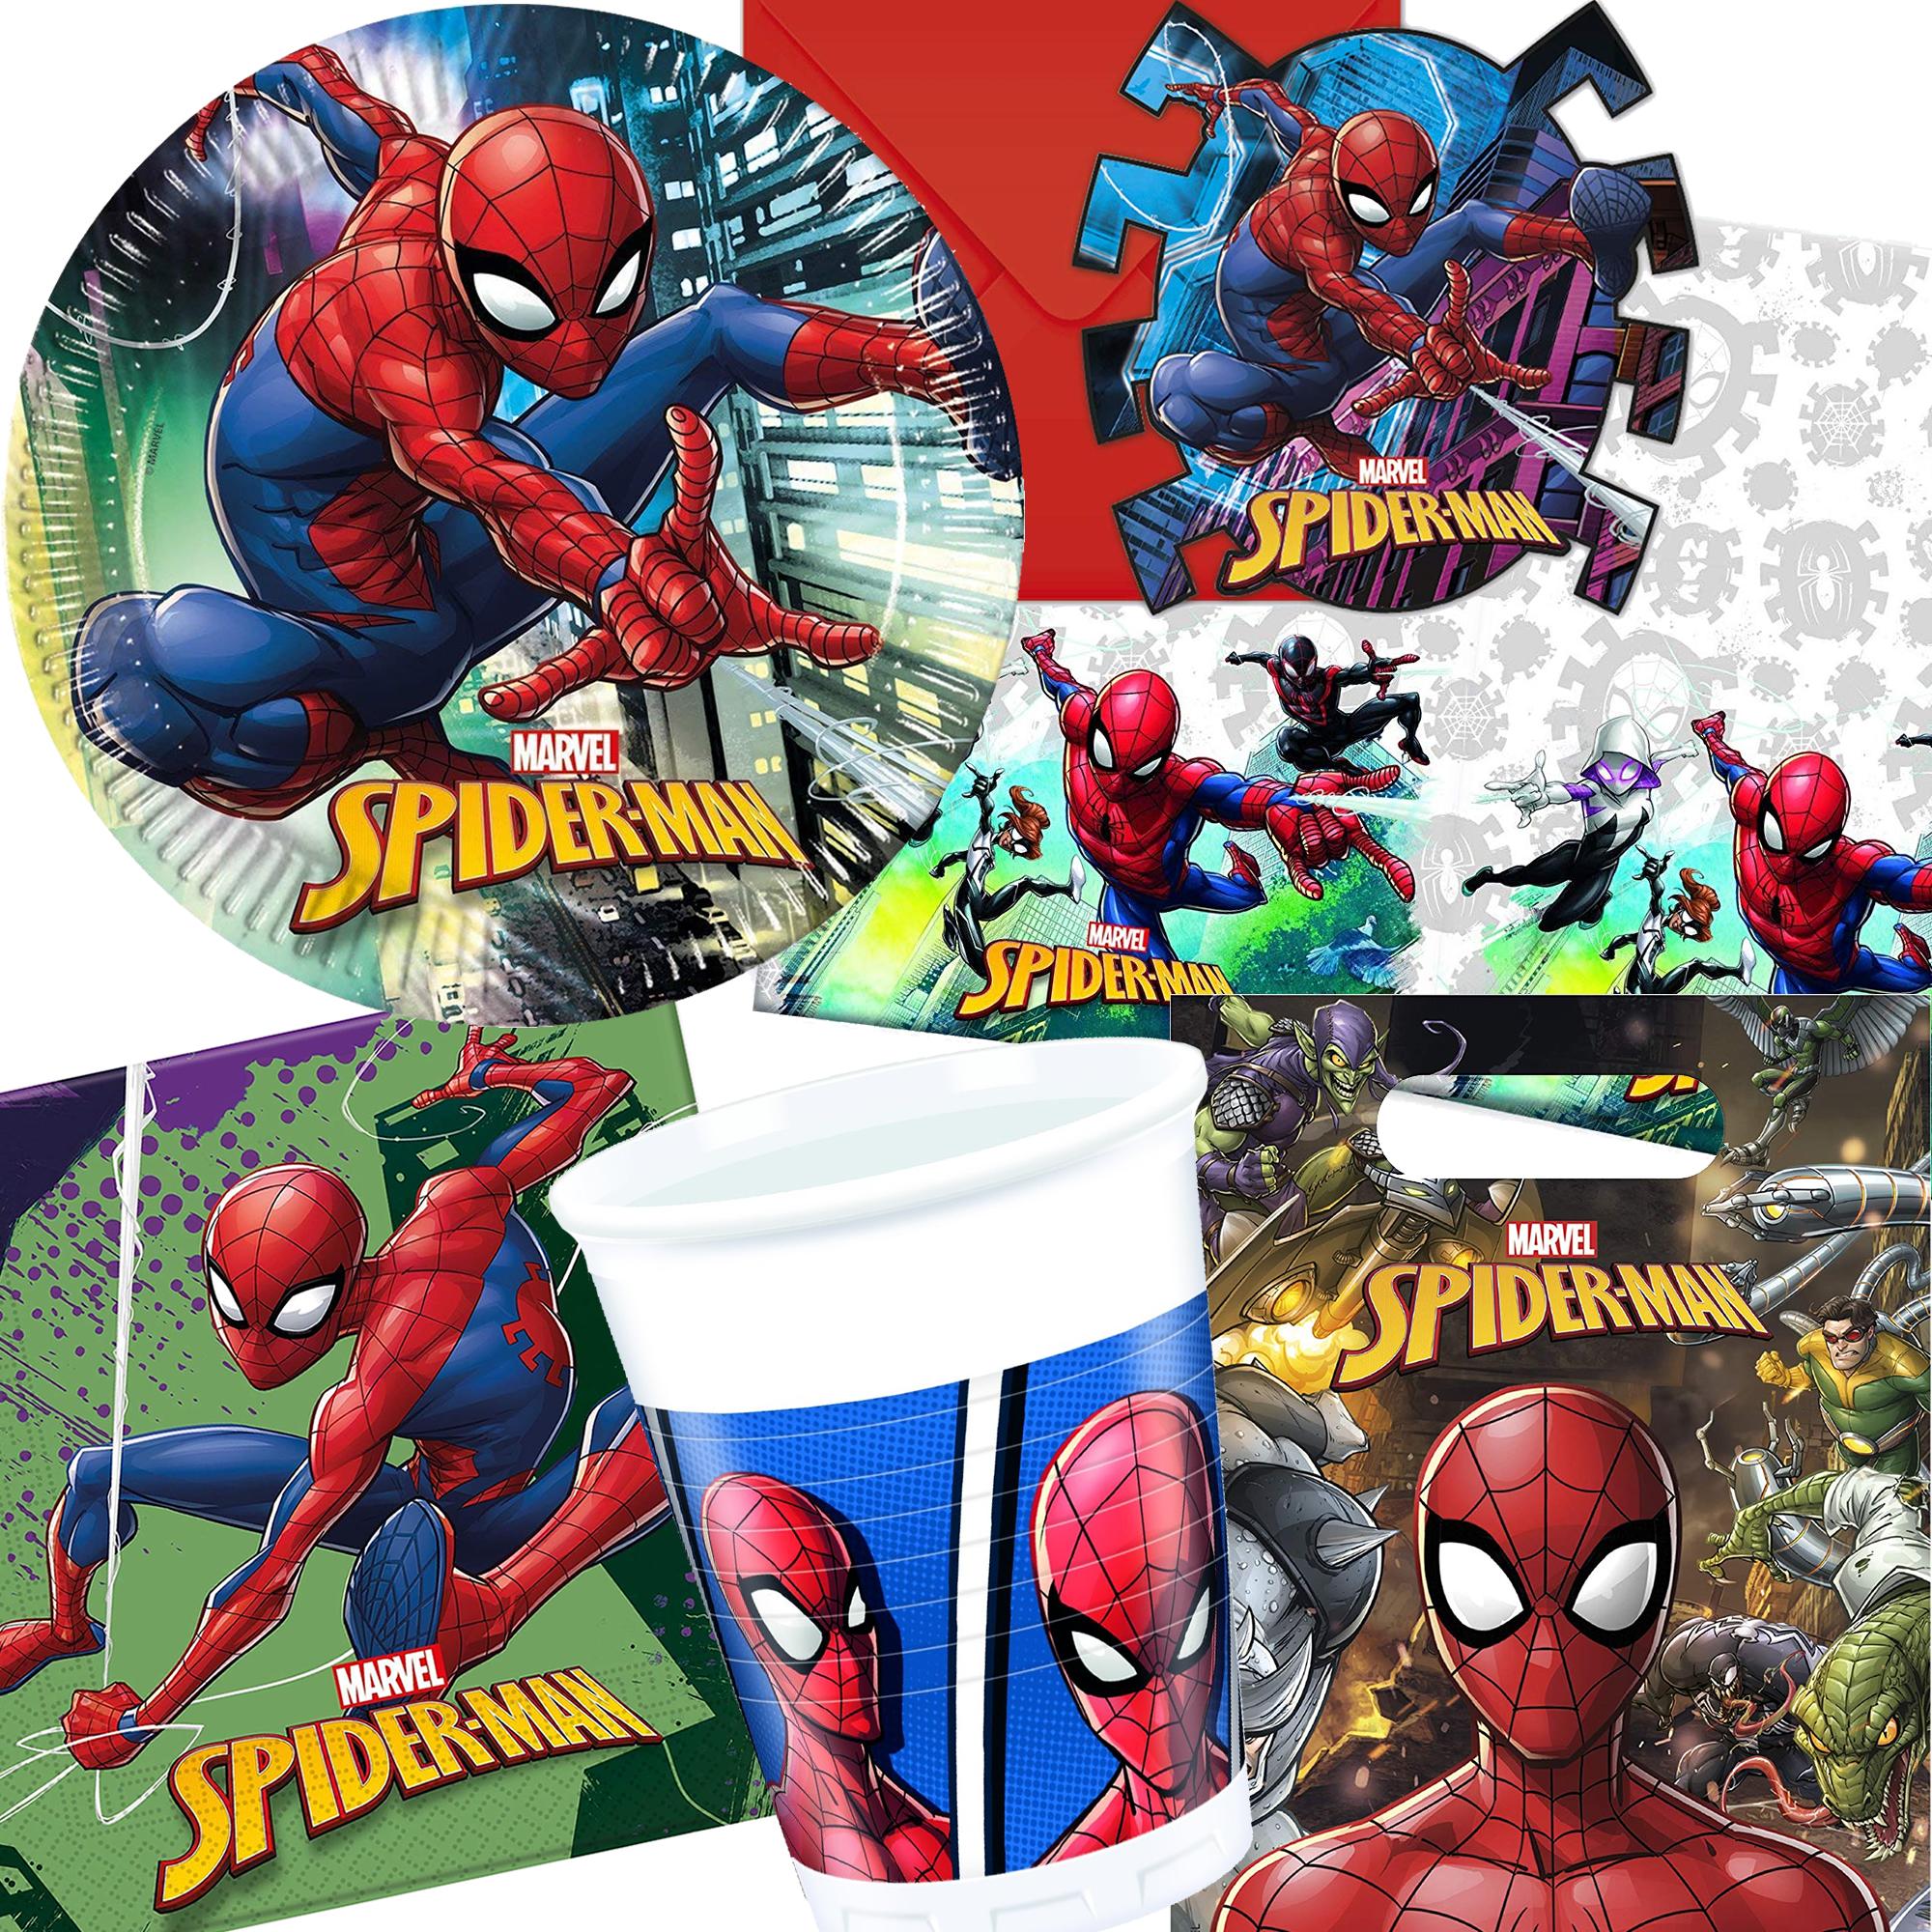 Spiderman Team Up